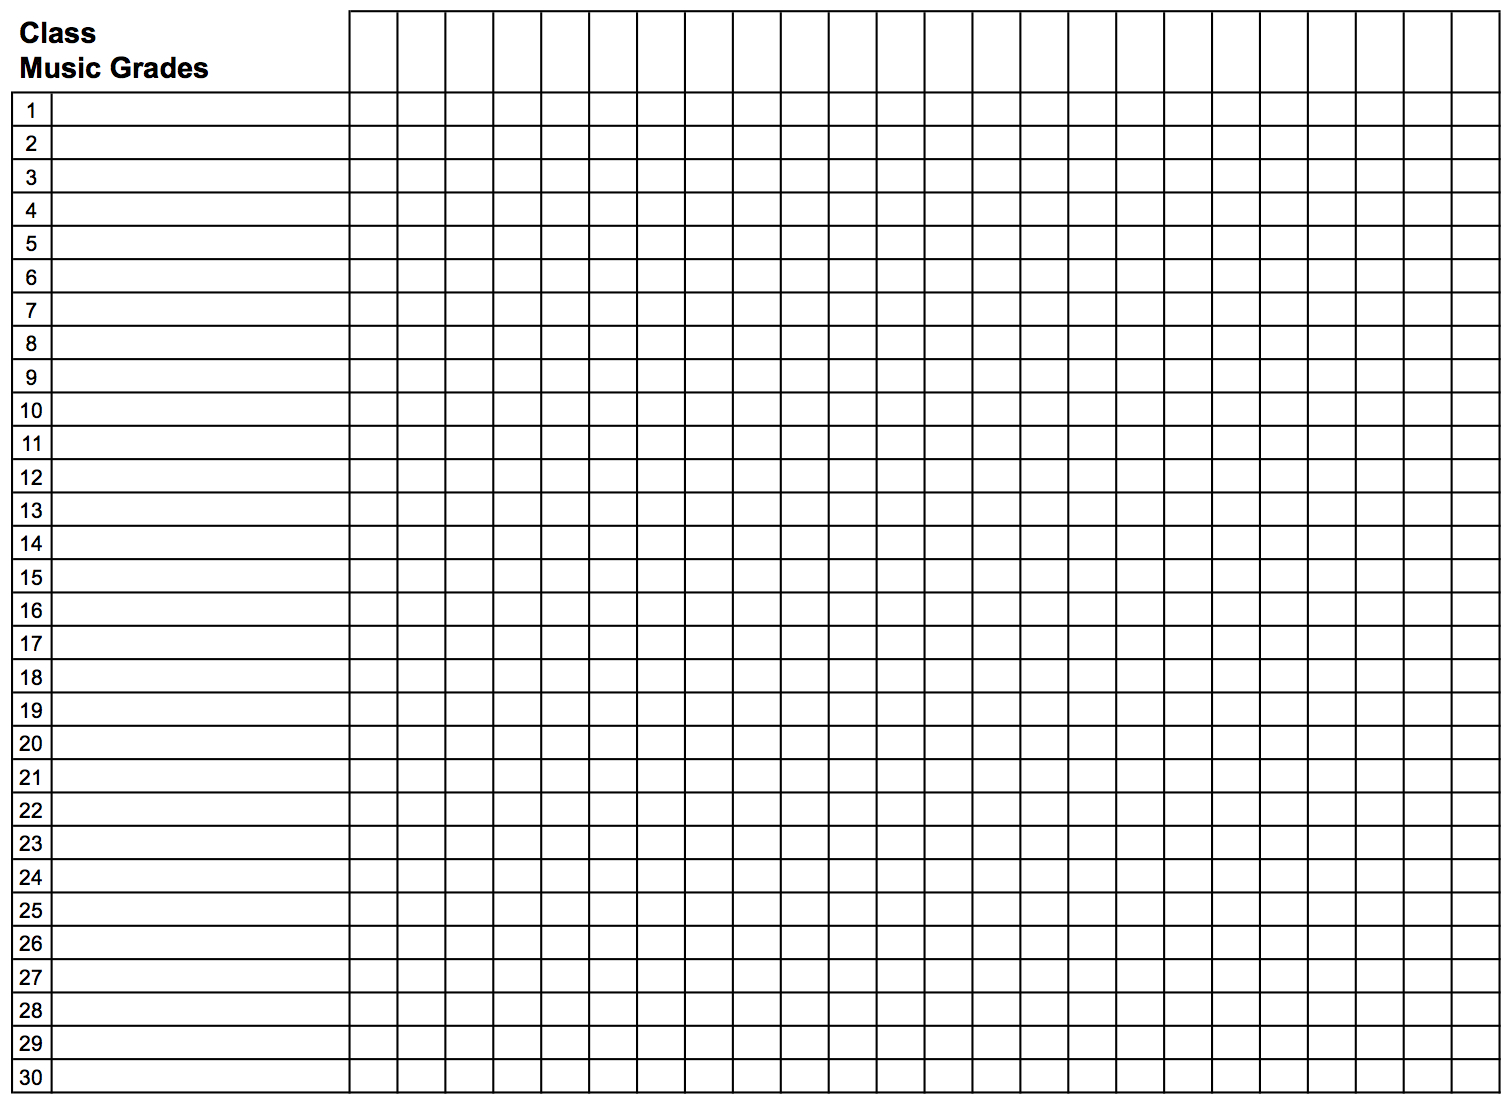 015 Teacher Grade Book Template Free Printable Grading Scale For - Free Printable Gradebook